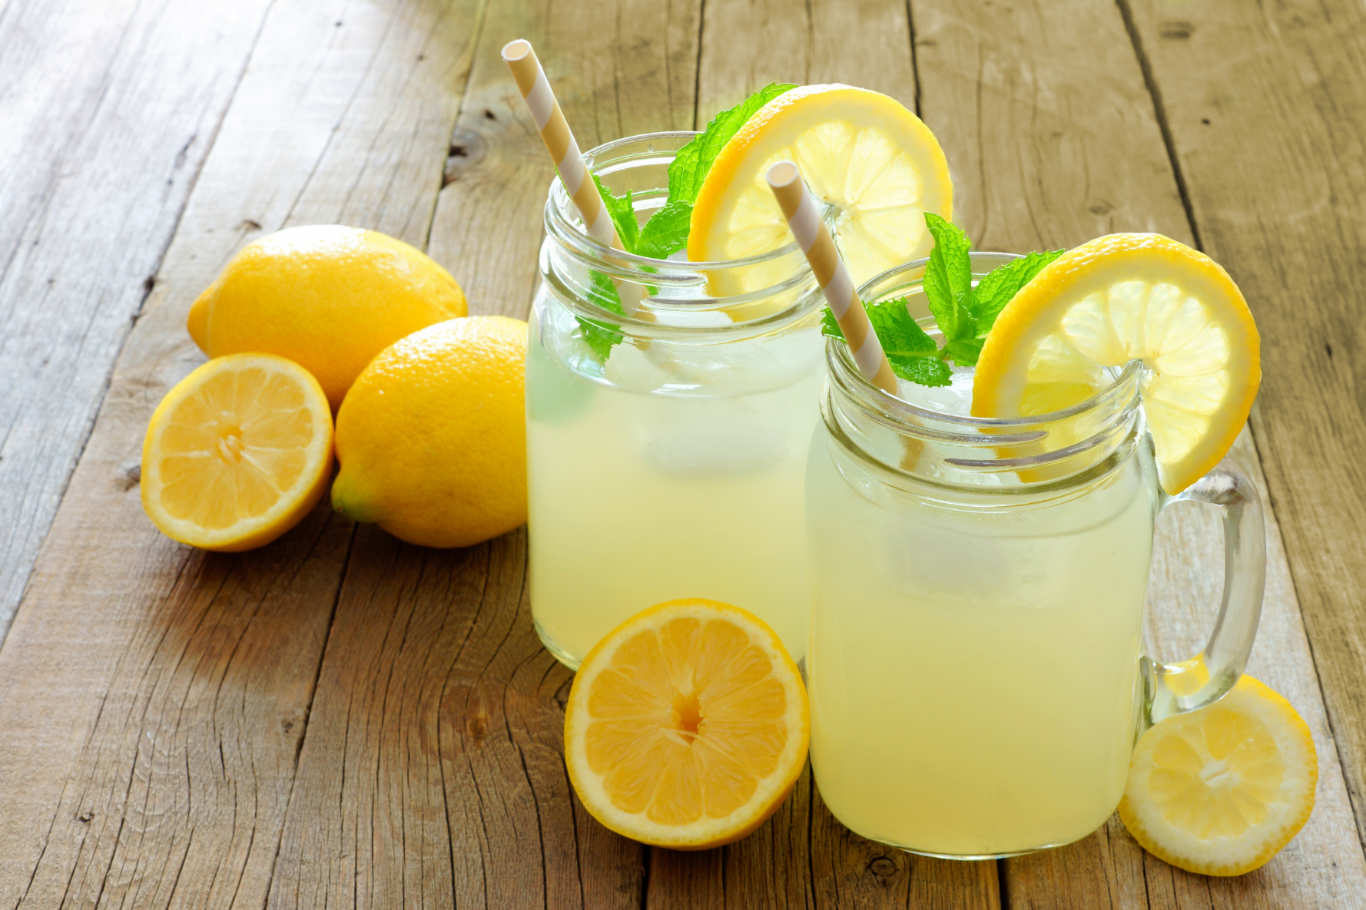 Homemade-lemonade-BestRecipeFinder